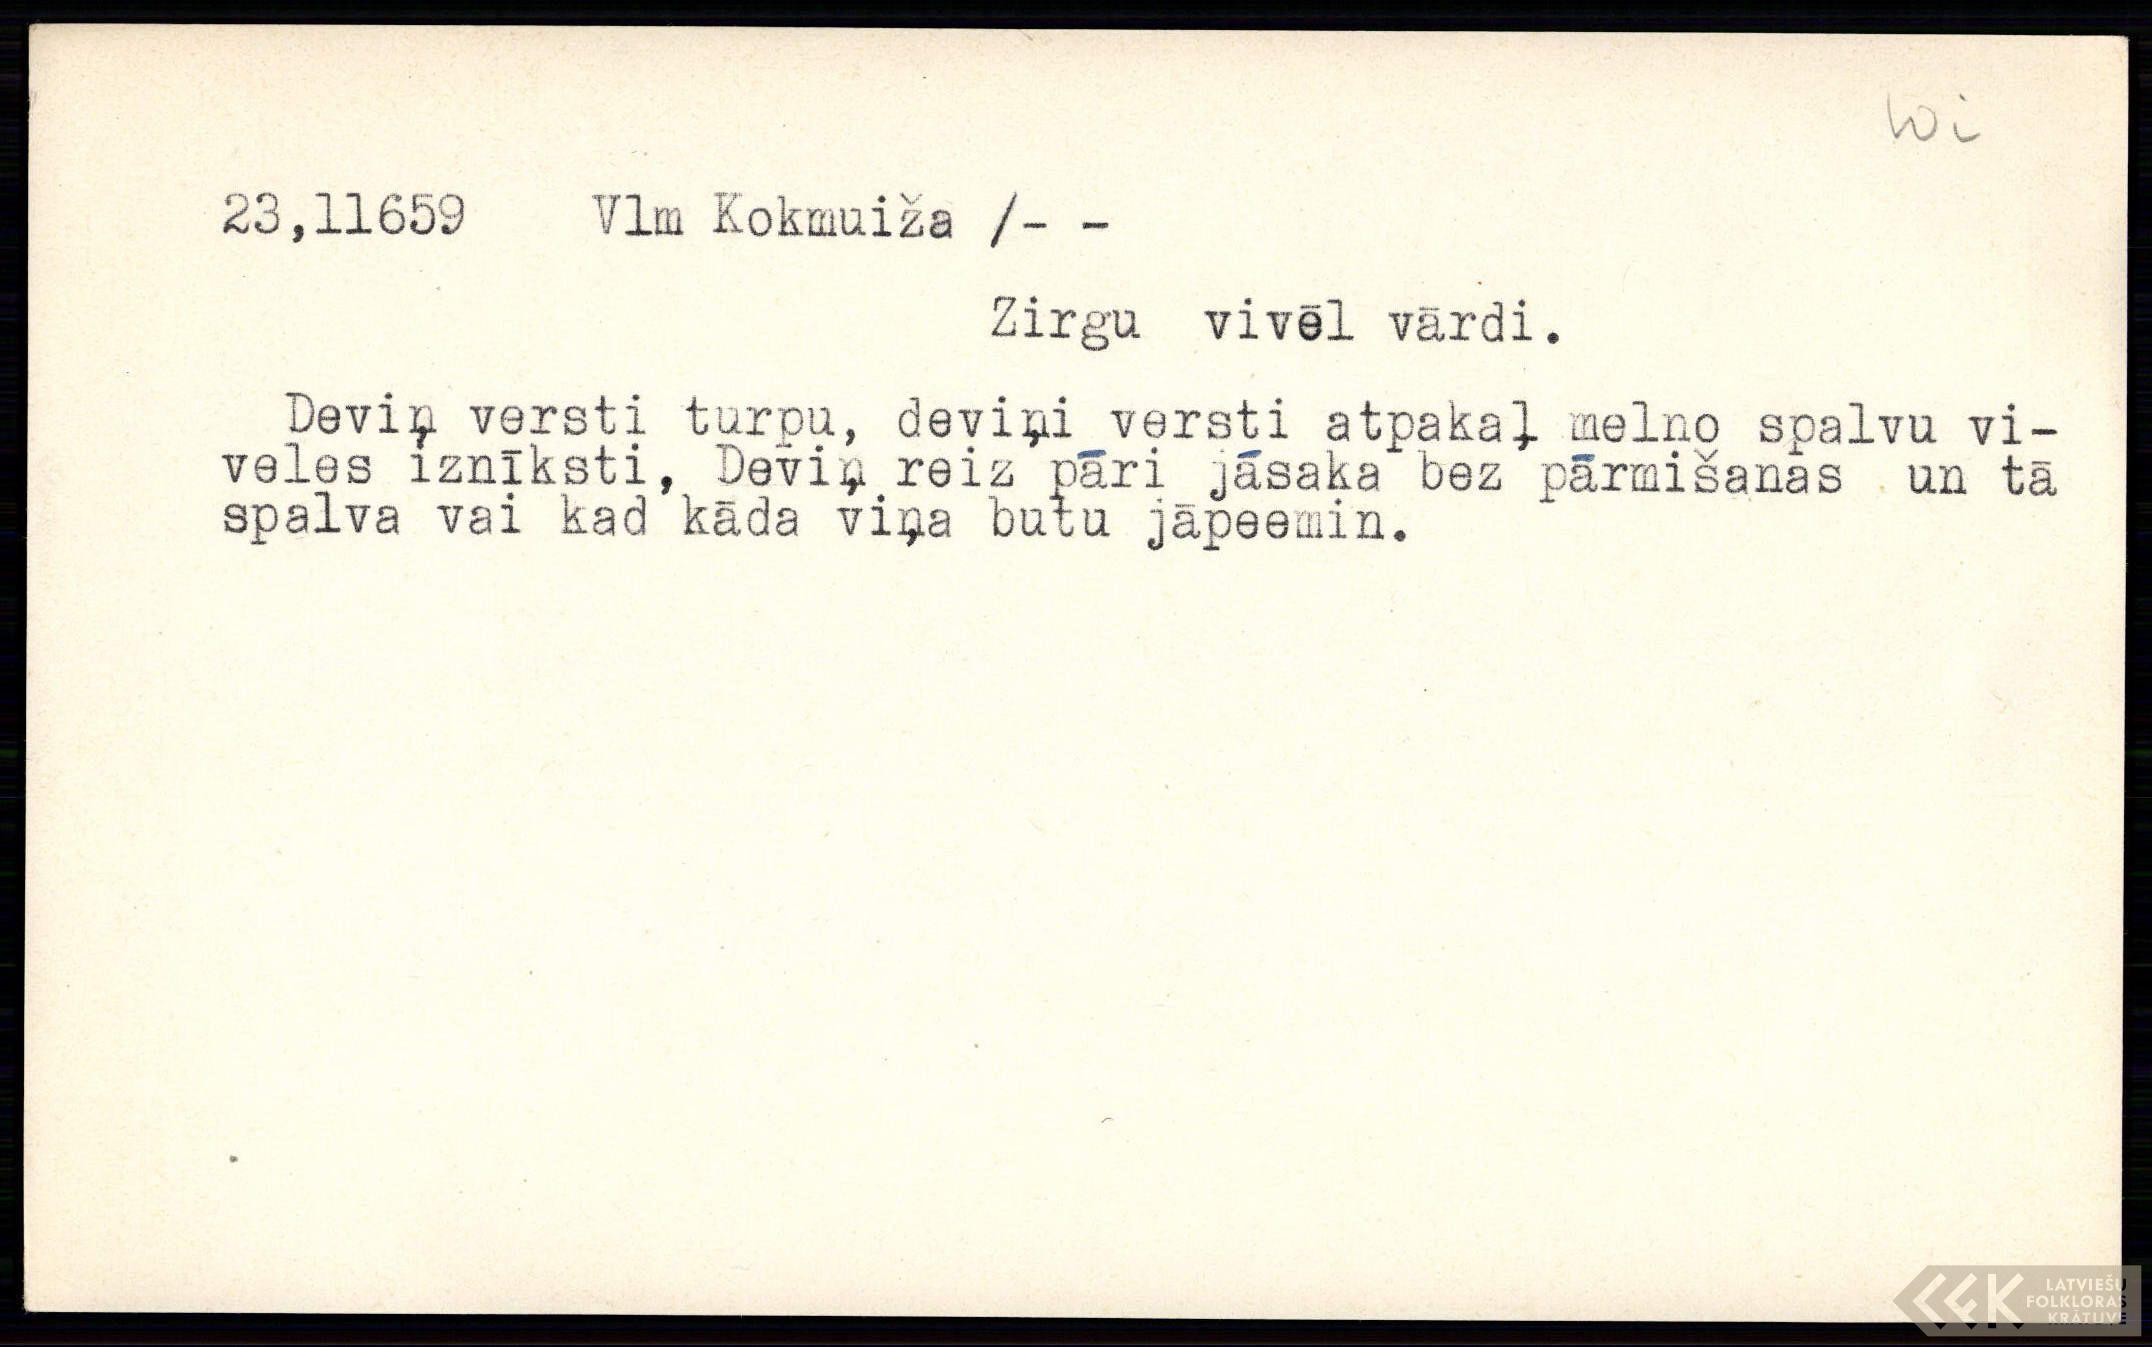 LFK-0023-11659-buramvardu-kartoteka